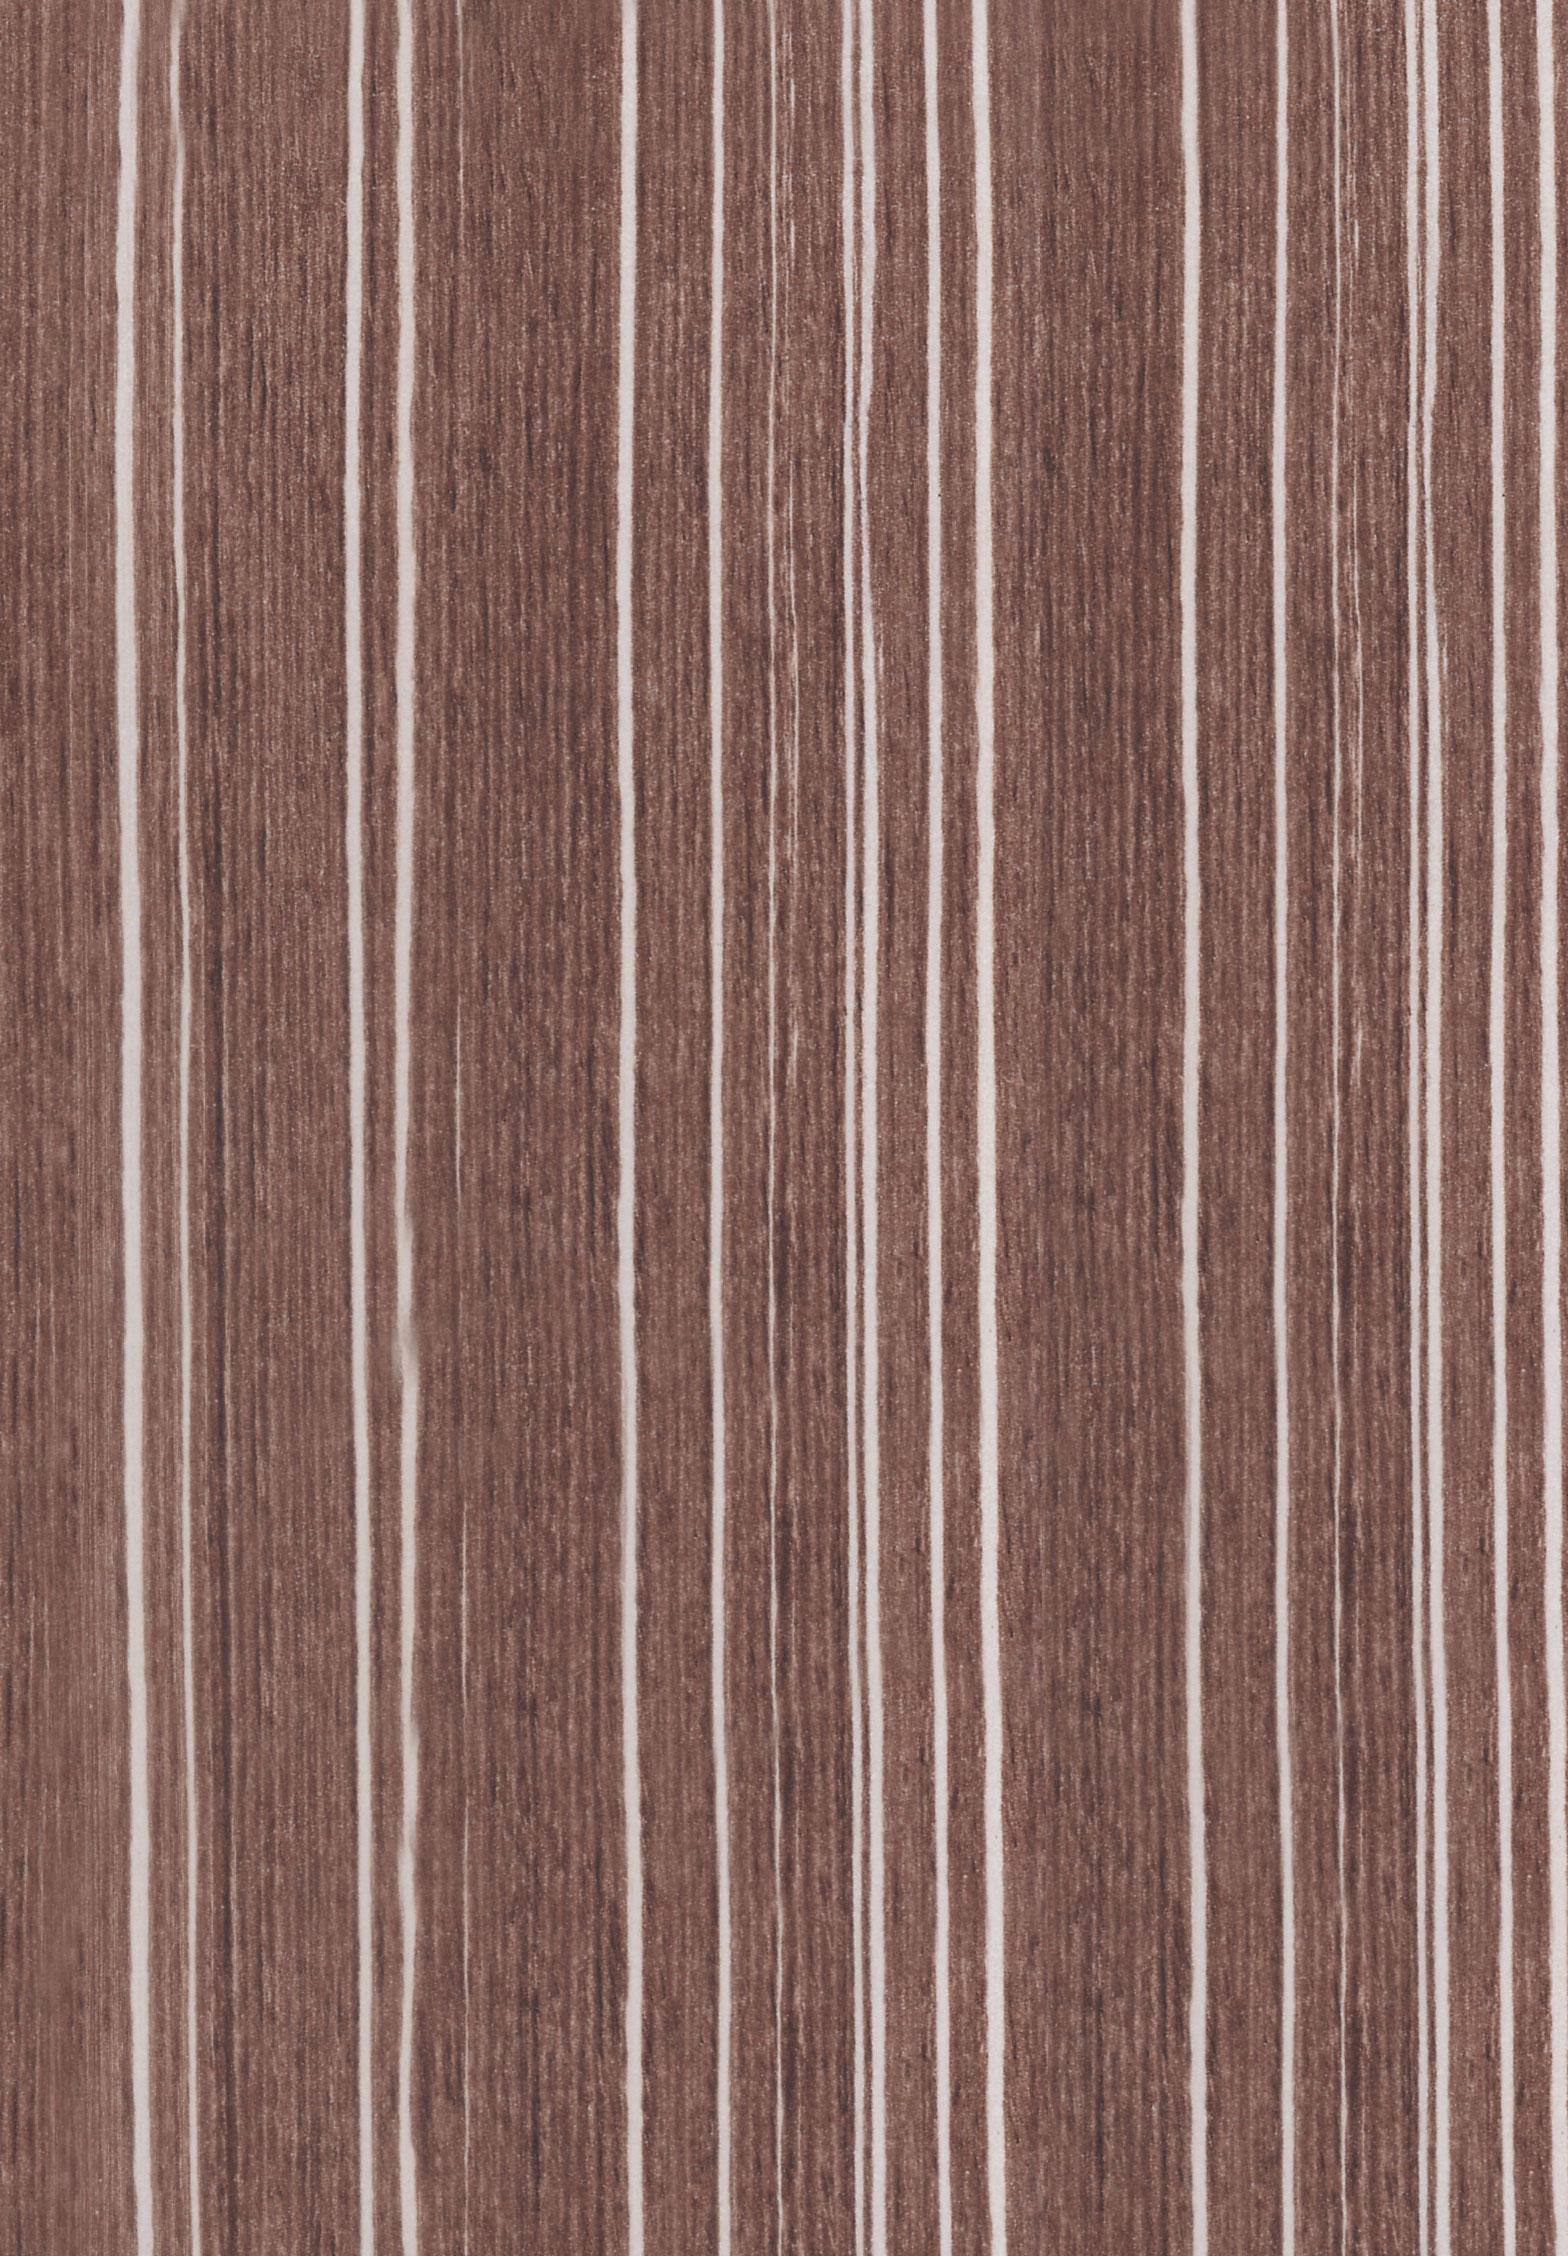 EWE 8297 S - Classic Line linear in the woods woograin high pressure laminate (hpl)